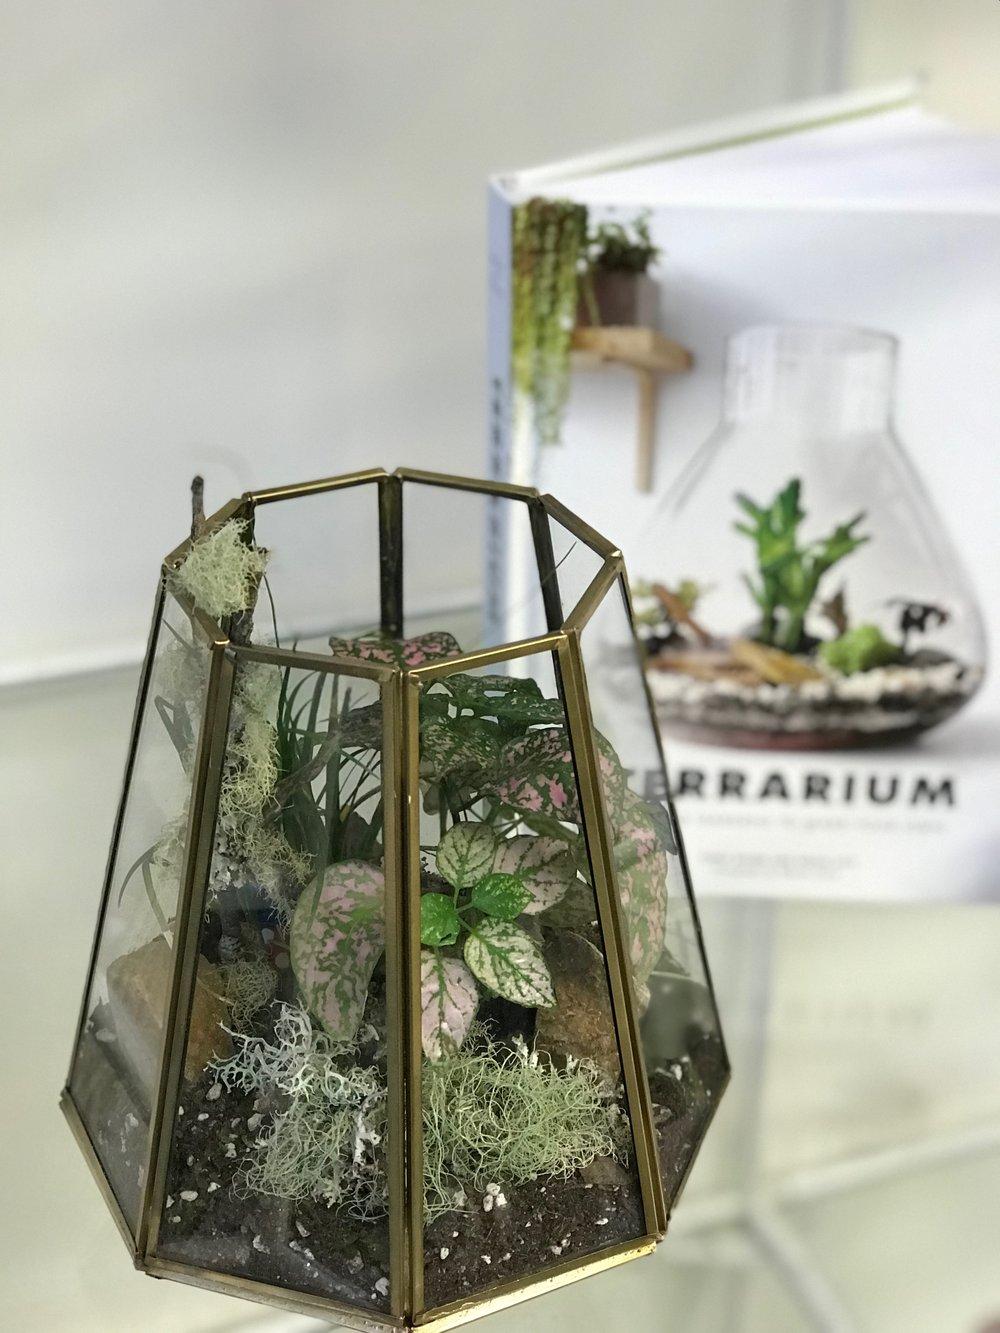 Terrariums - Creating a closed environment can create an ecosystem in a beautiful desktop garden.